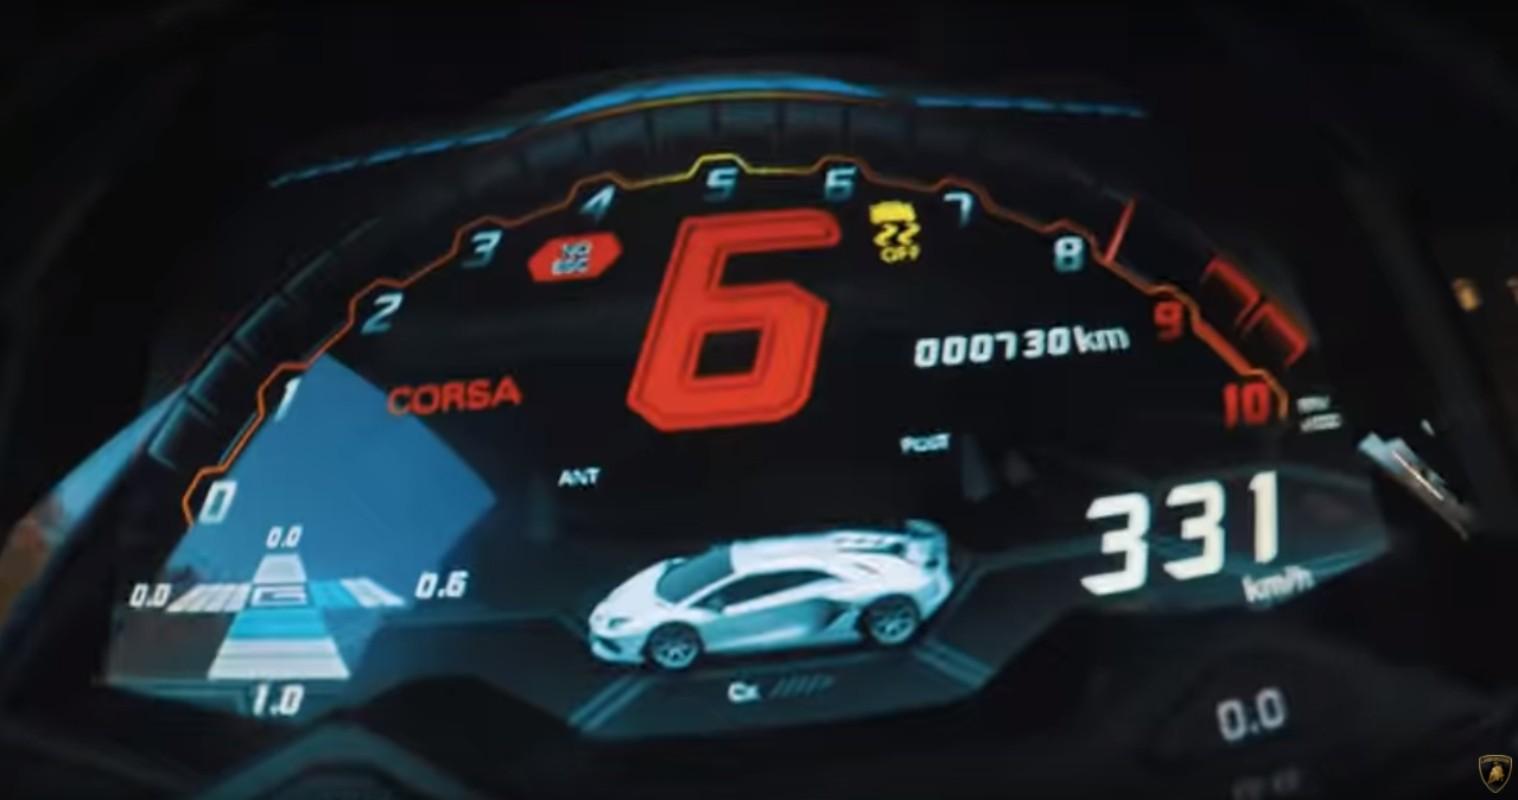 SVJ's speedo reading in excess of 331 km/h.